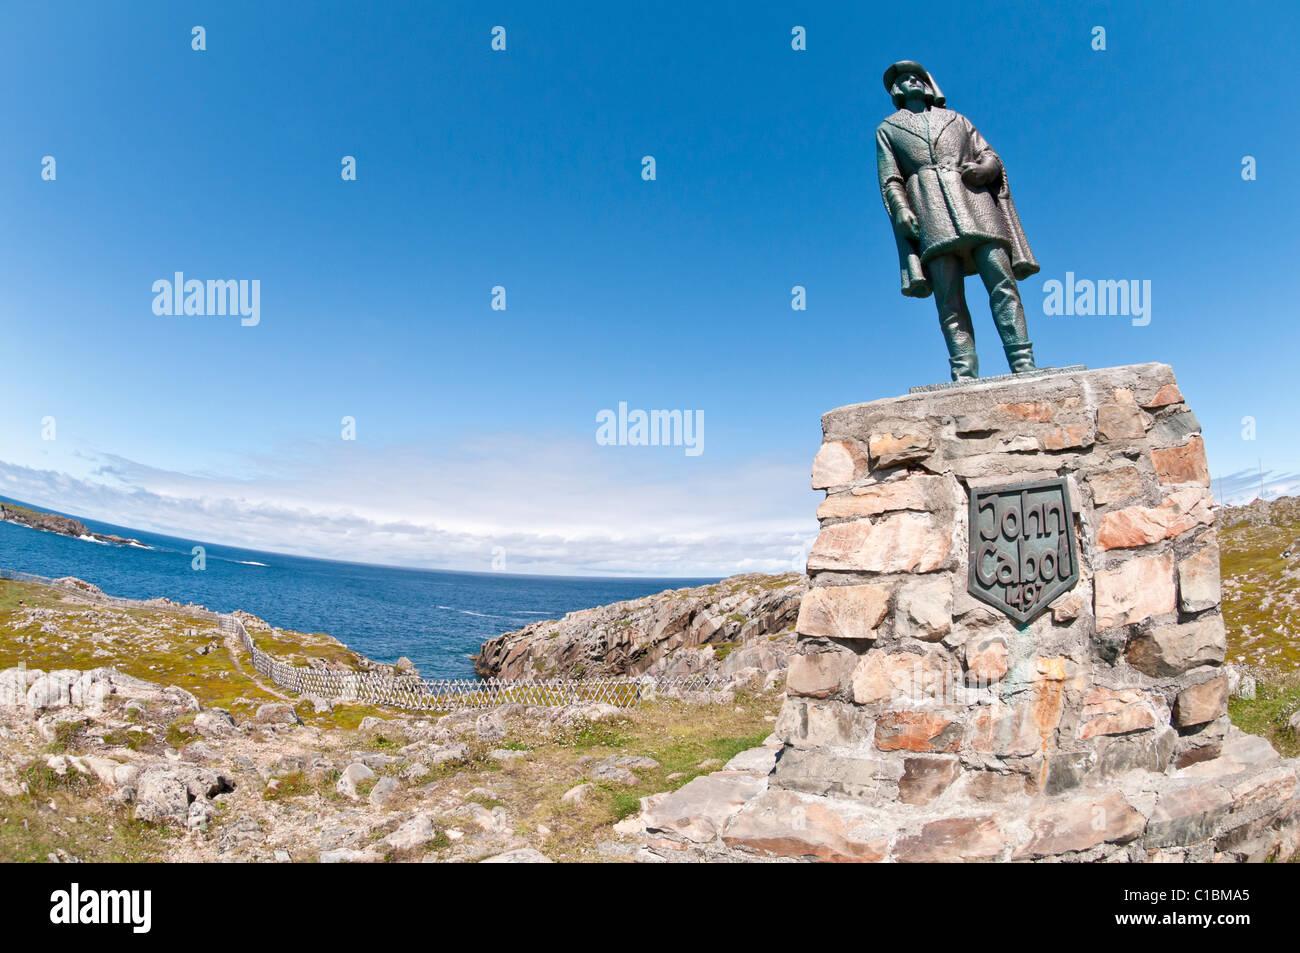 Statue of John Cabot, Cape Bonavista, Bonavista Peninsula, Newfoundland, Canada - Stock Image